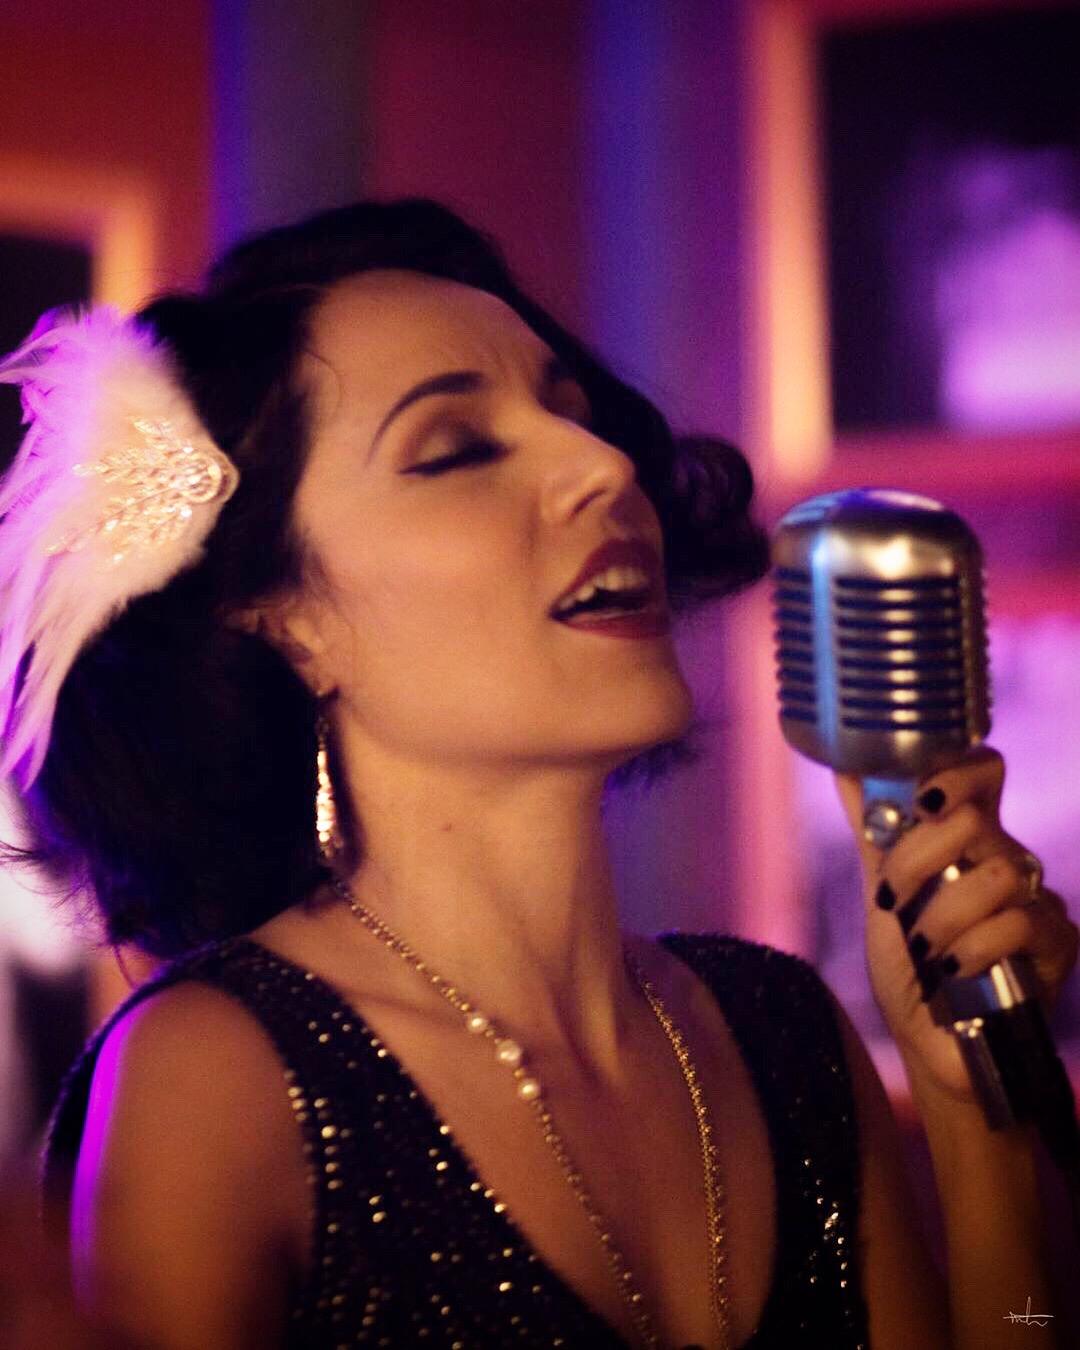 Jazz Vocalist Jackie Lopez - Vintage Glamour